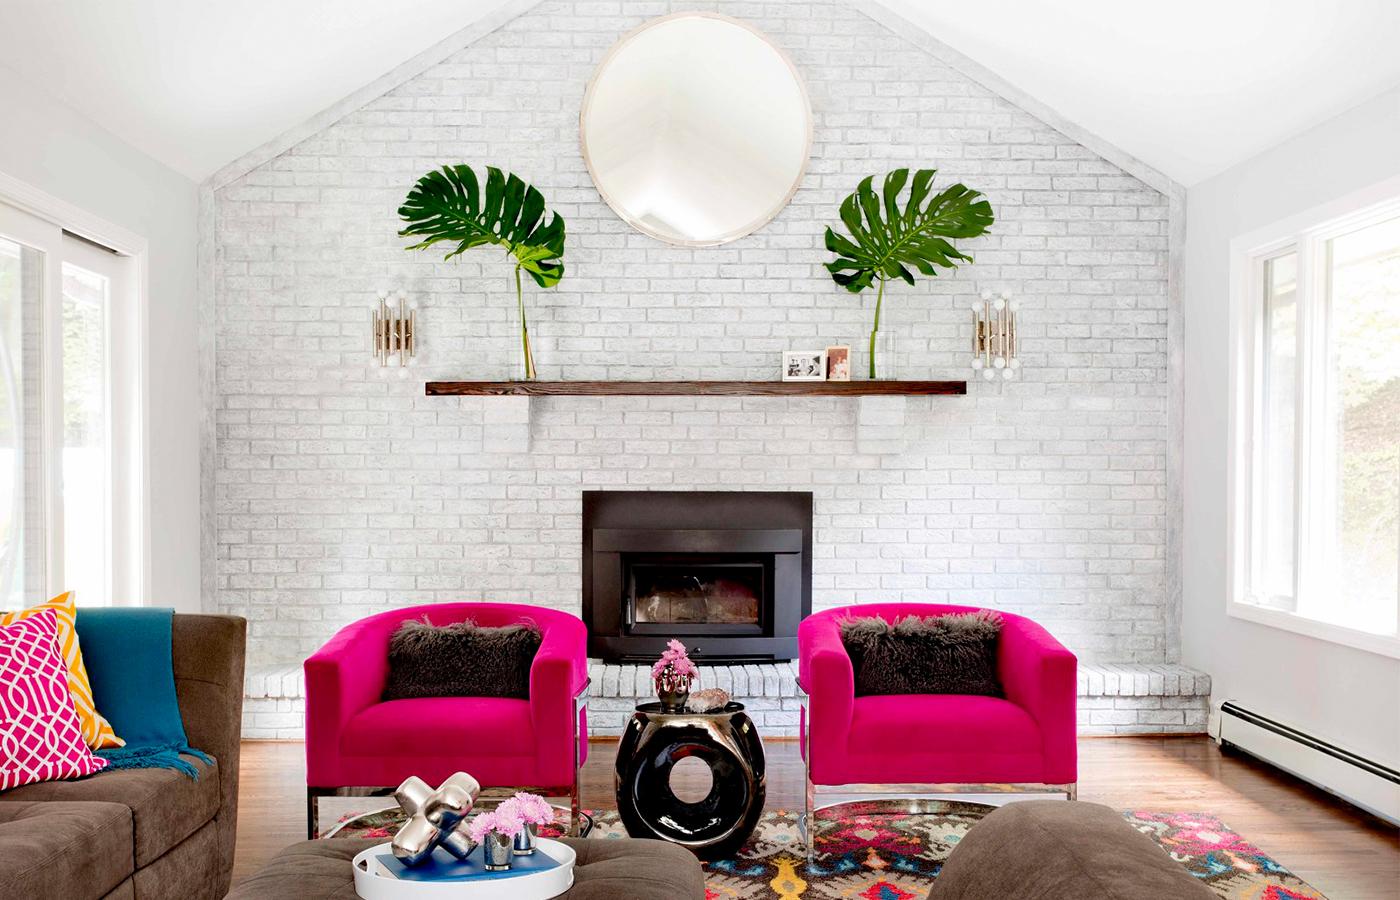 deco design forum interiors forum deco forum dacco. Black Bedroom Furniture Sets. Home Design Ideas